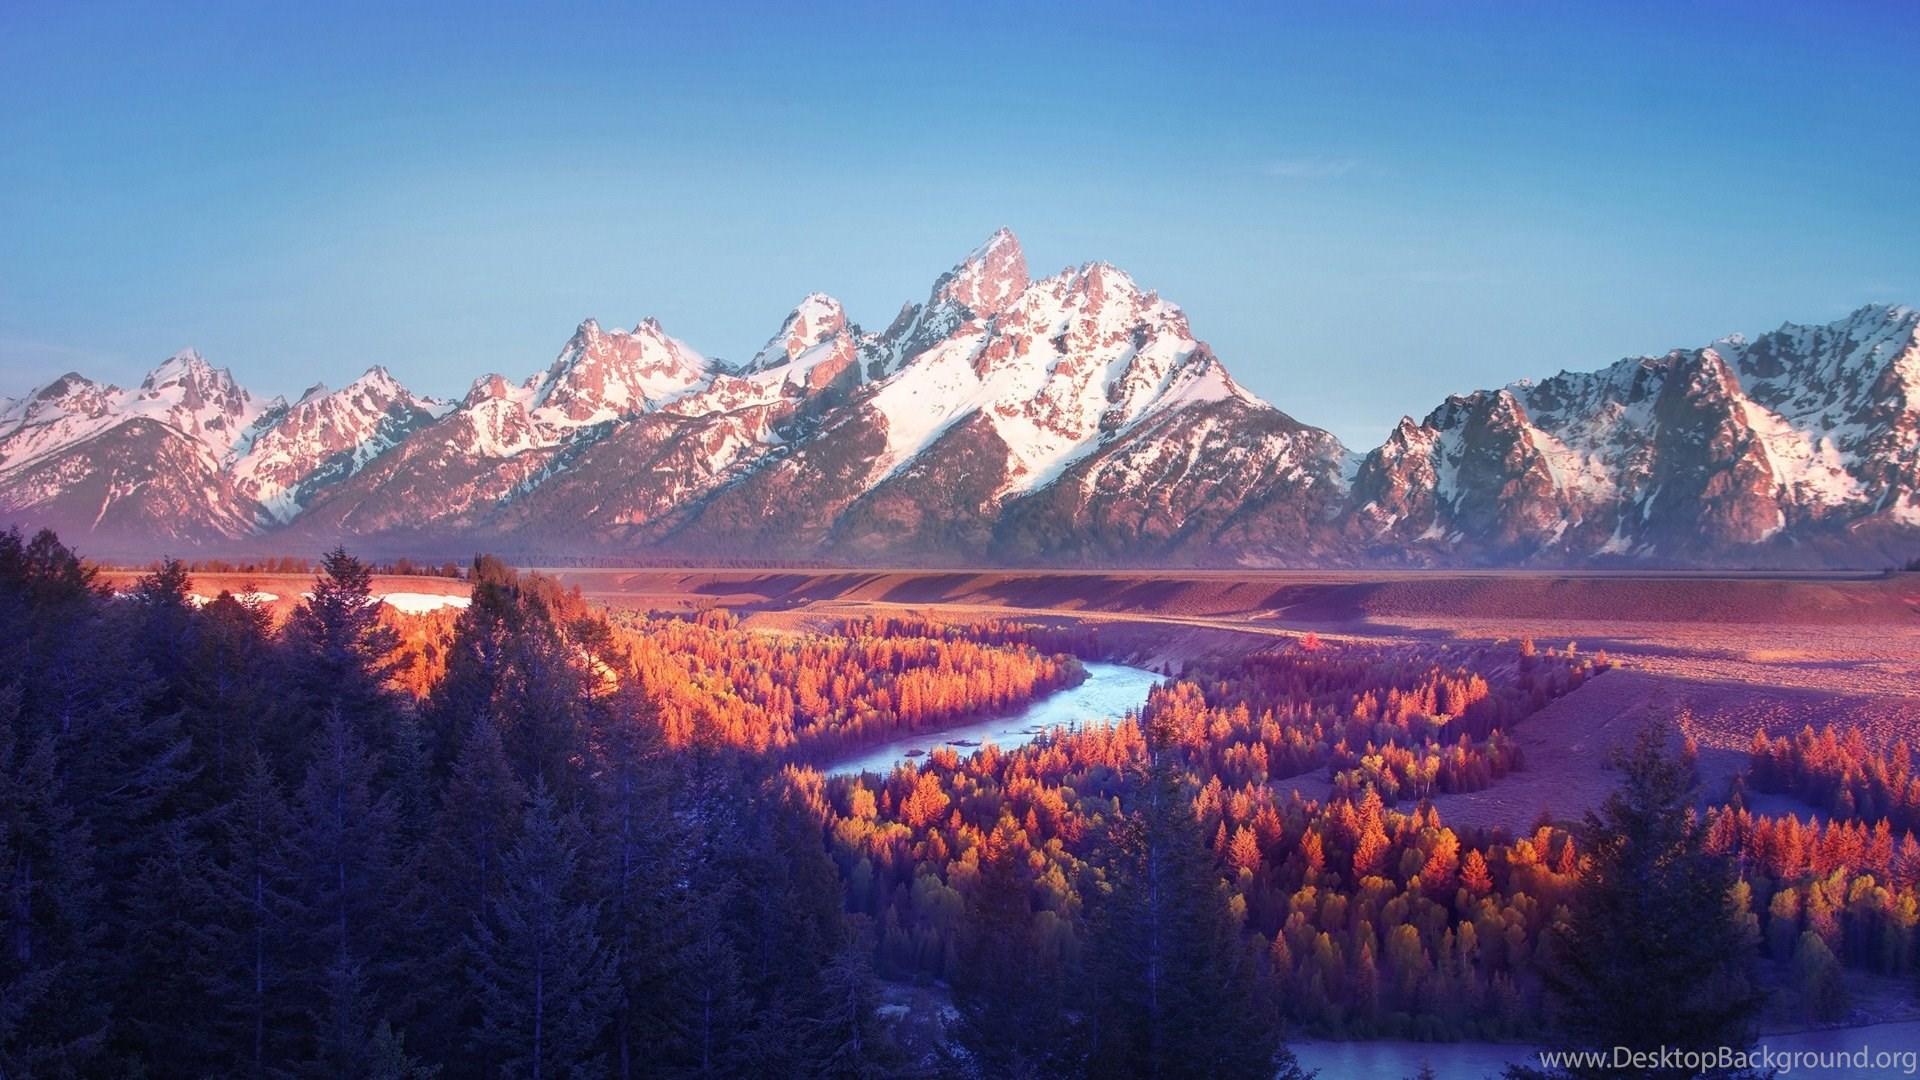 Cool And Beautiful Nature Desktop Wallpaper Image: High Resolution Beautiful Nature Mountain Landscape